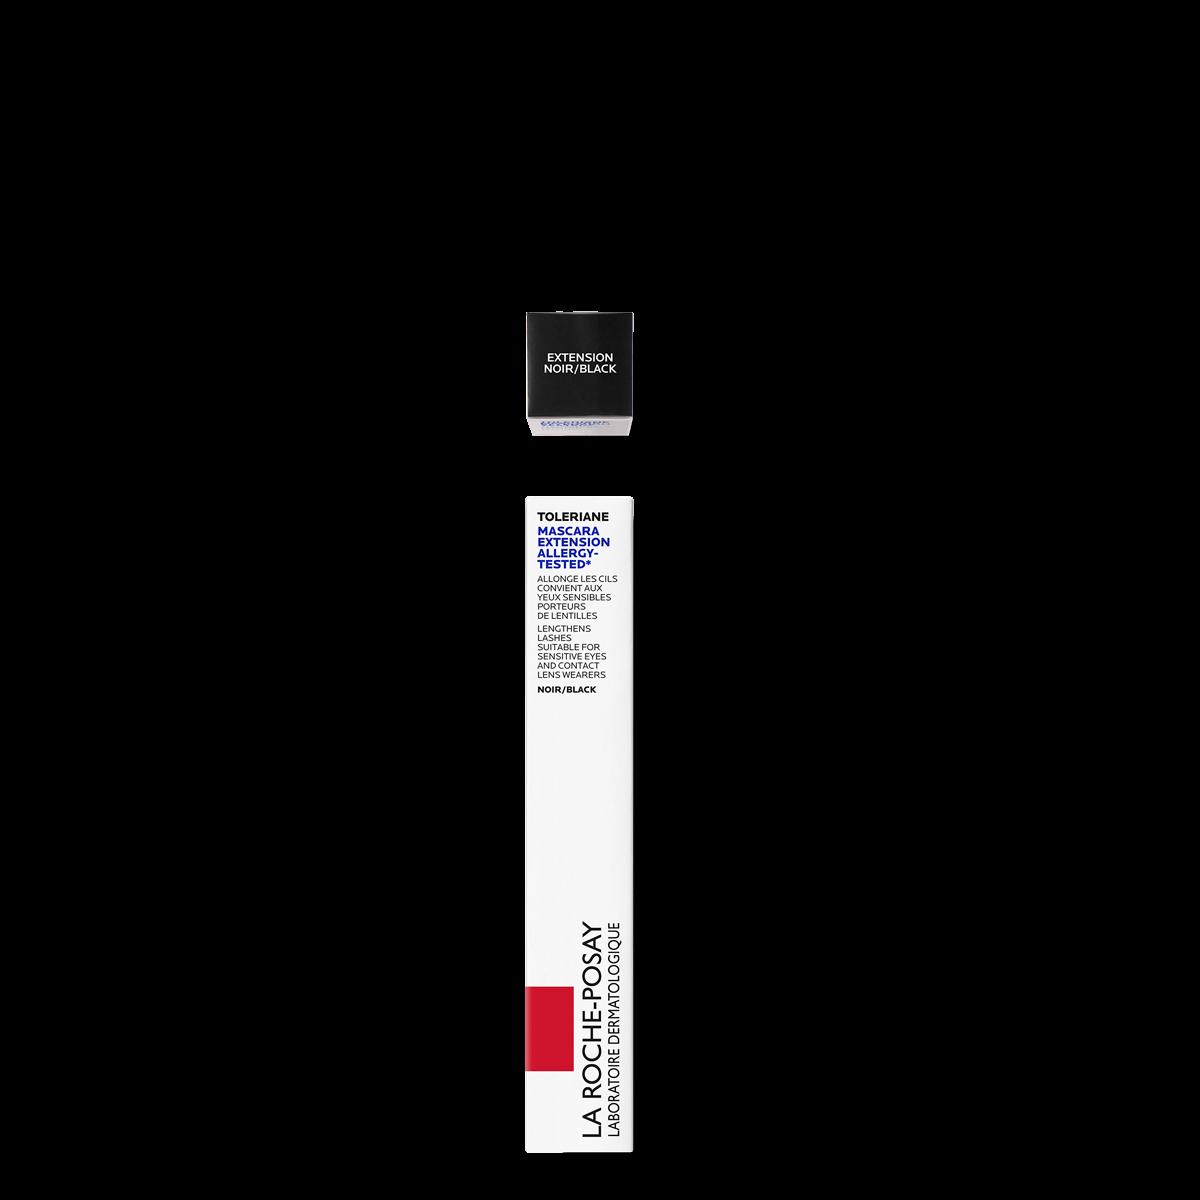 La Roche Posay Sensitiv Toleriane Sminke EXTENSION MASCARA Sort 333